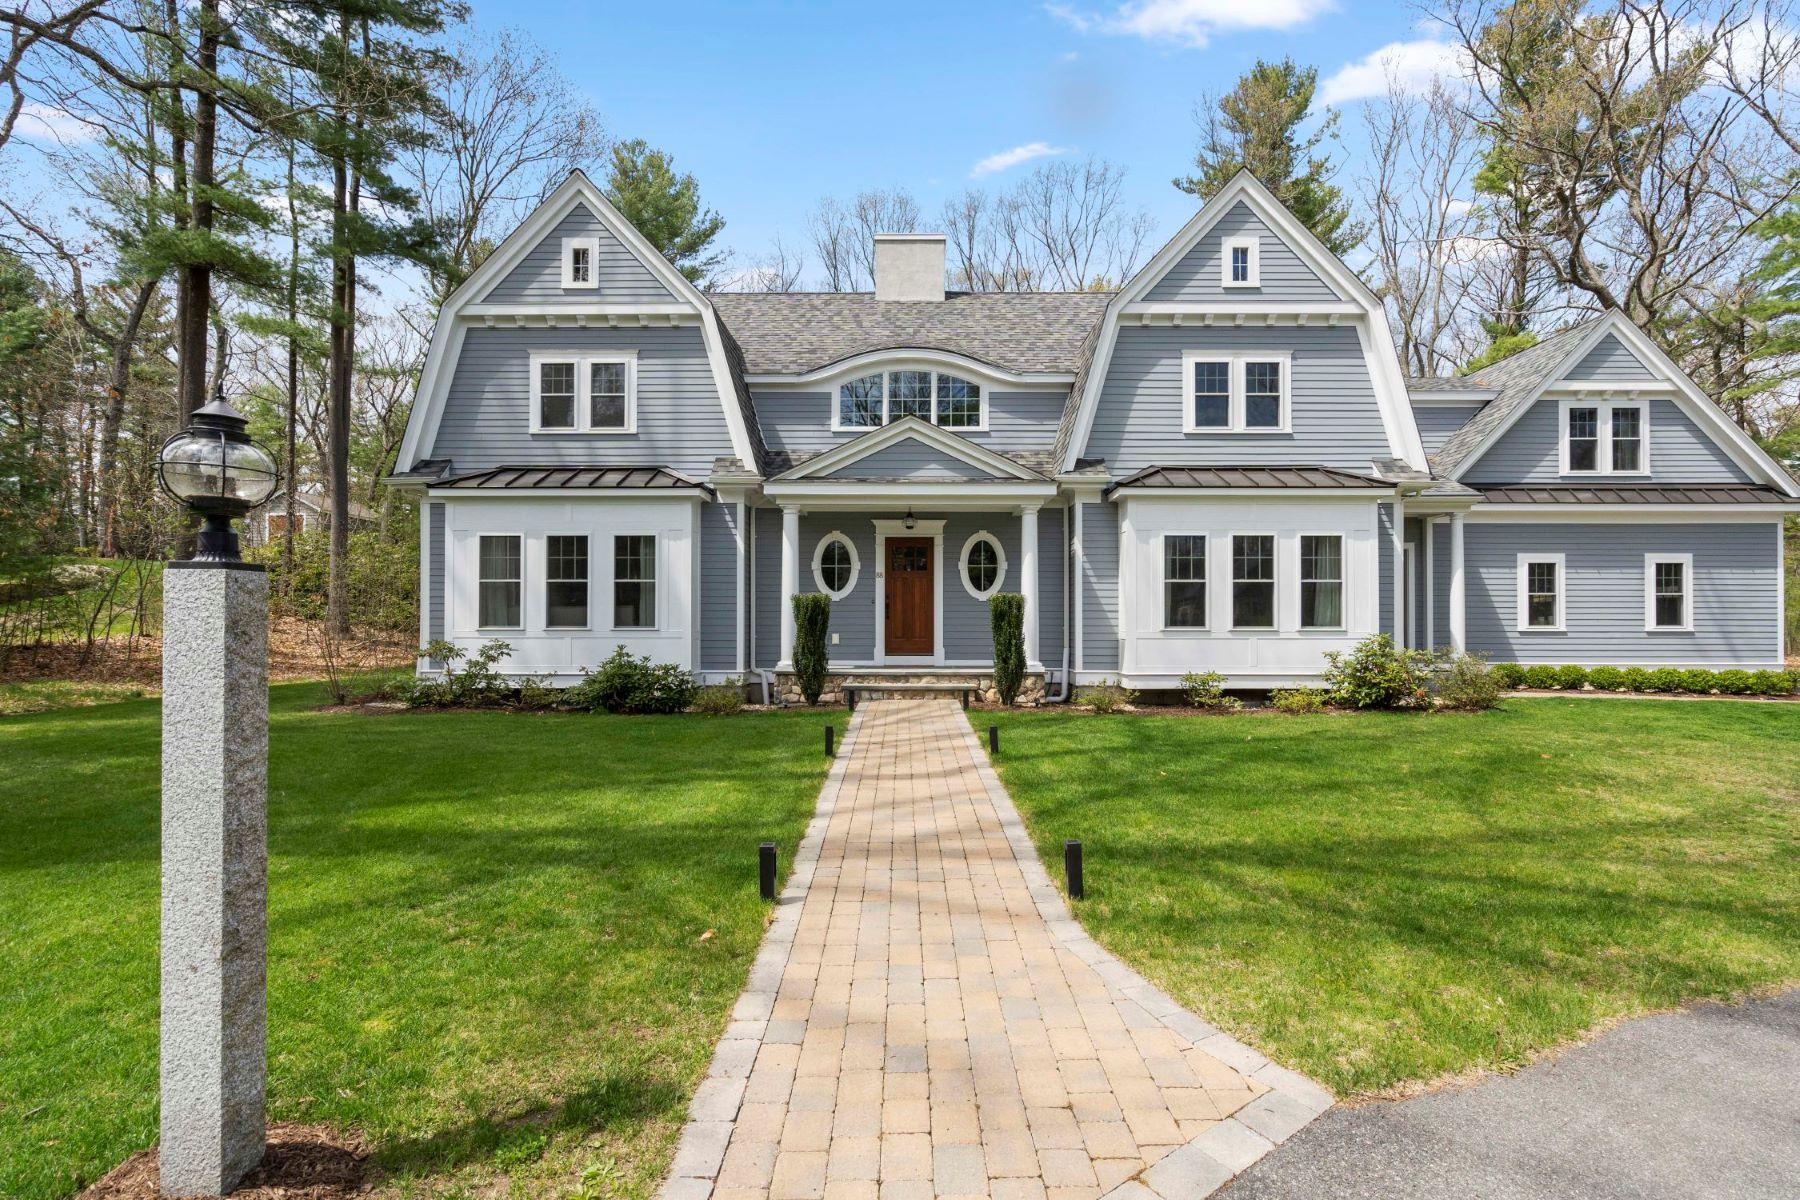 Single Family Homes για την Πώληση στο 88 Sweetwater Ave. Bedford, Μασαχουσετη 01730 Ηνωμένες Πολιτείες